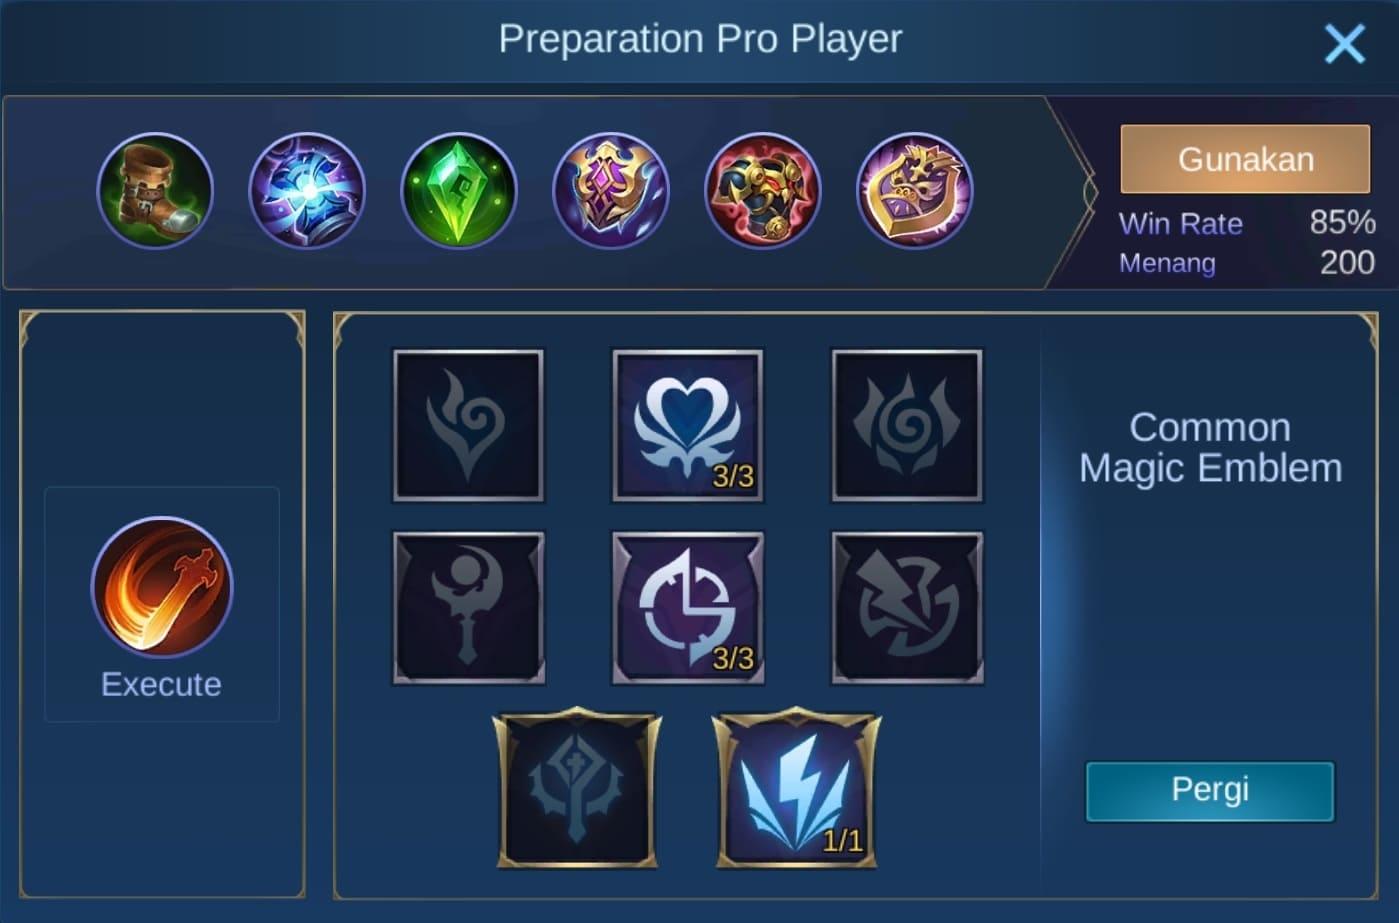 build item silvanna mobile legends (ML)